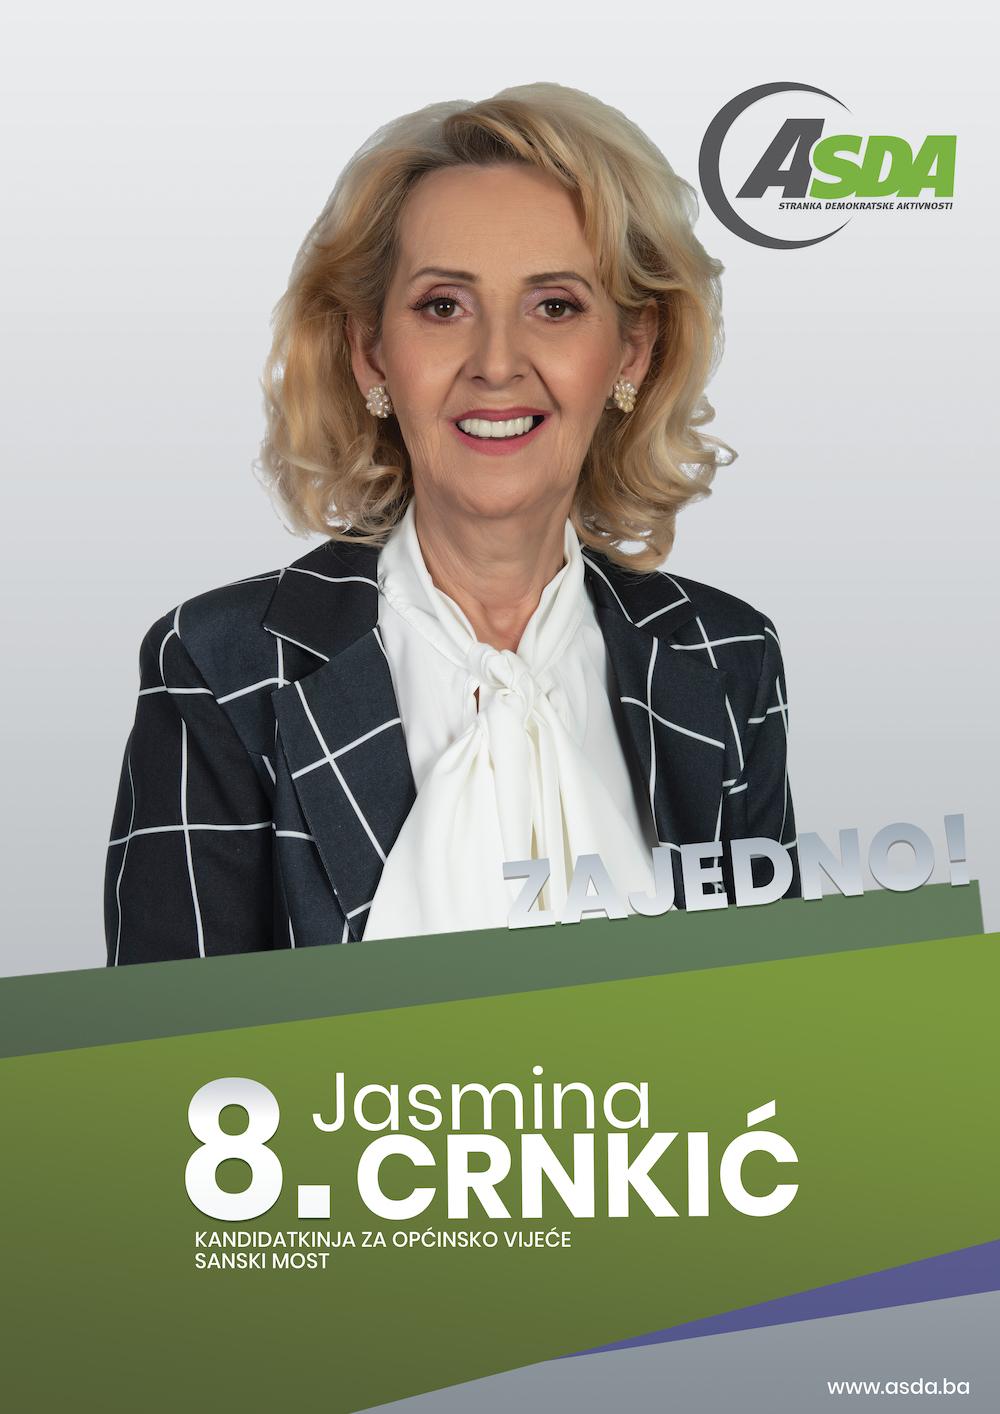 Jasmina Crnkić